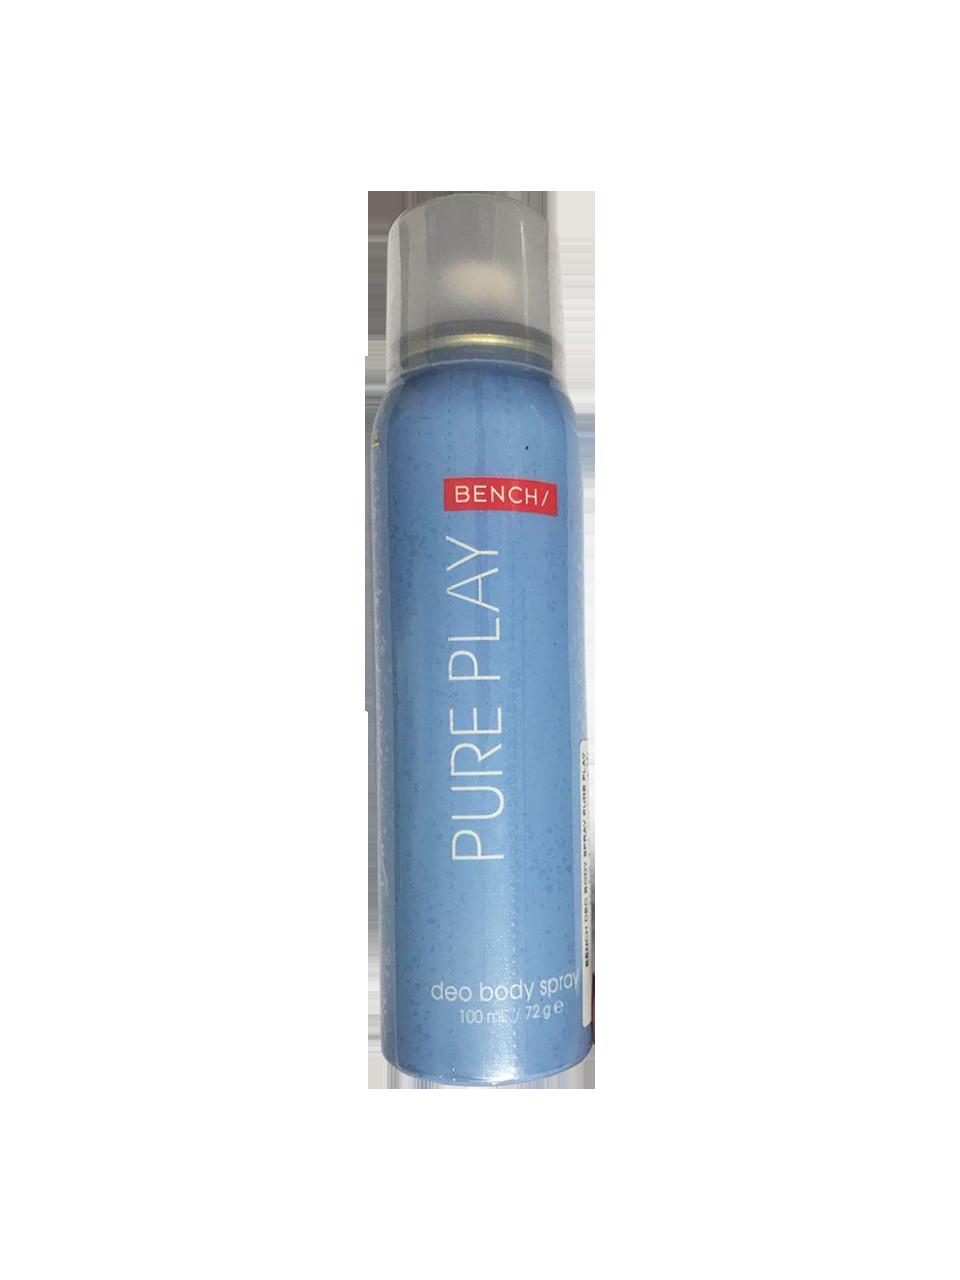 Bench Pure Play Deo Body Spray 100ml